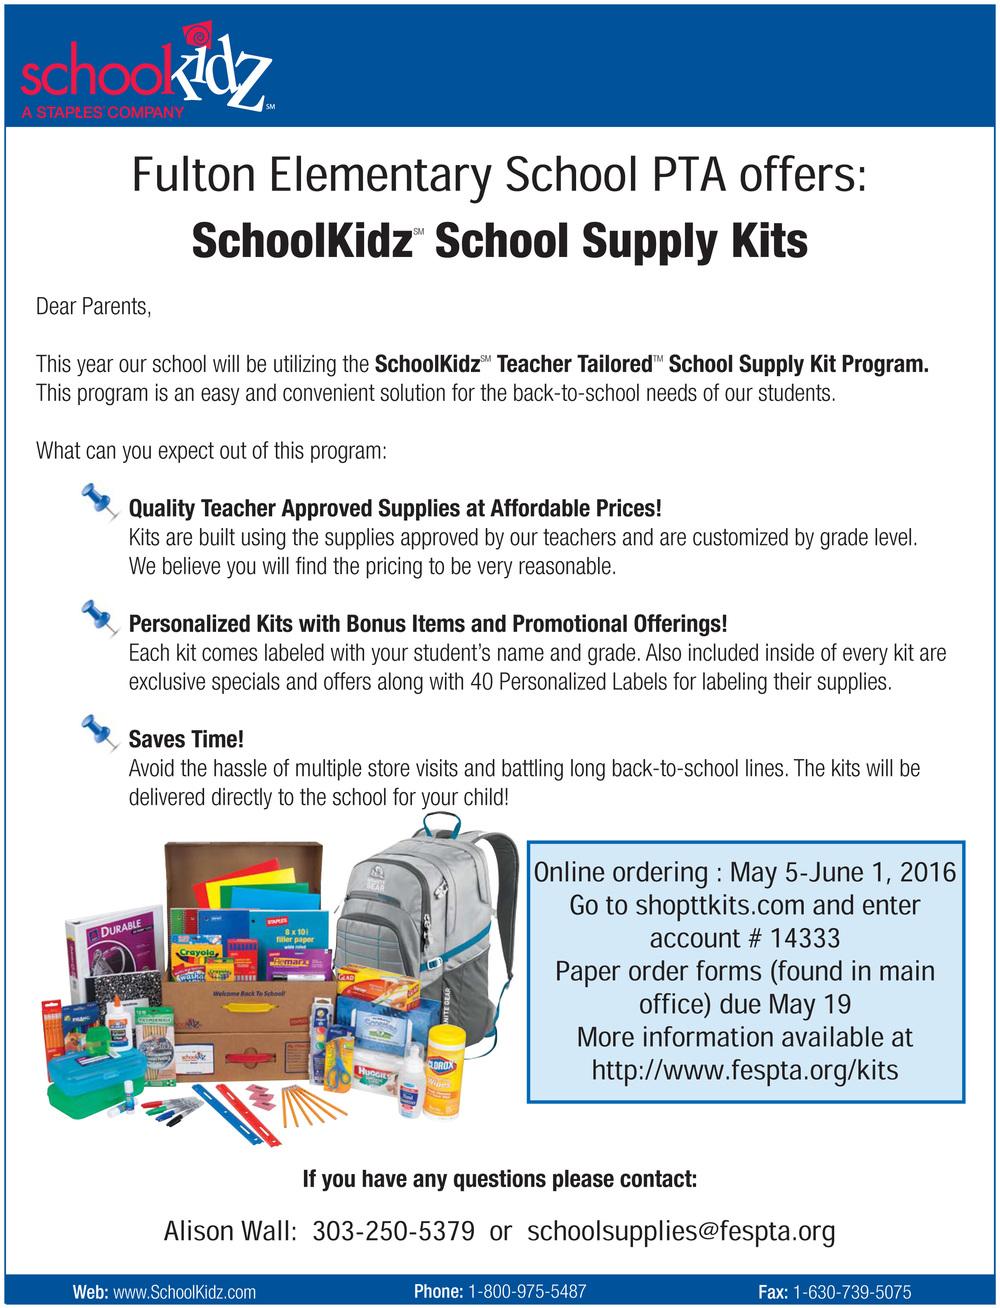 Back to School Kits — Fulton Elementary School PTA